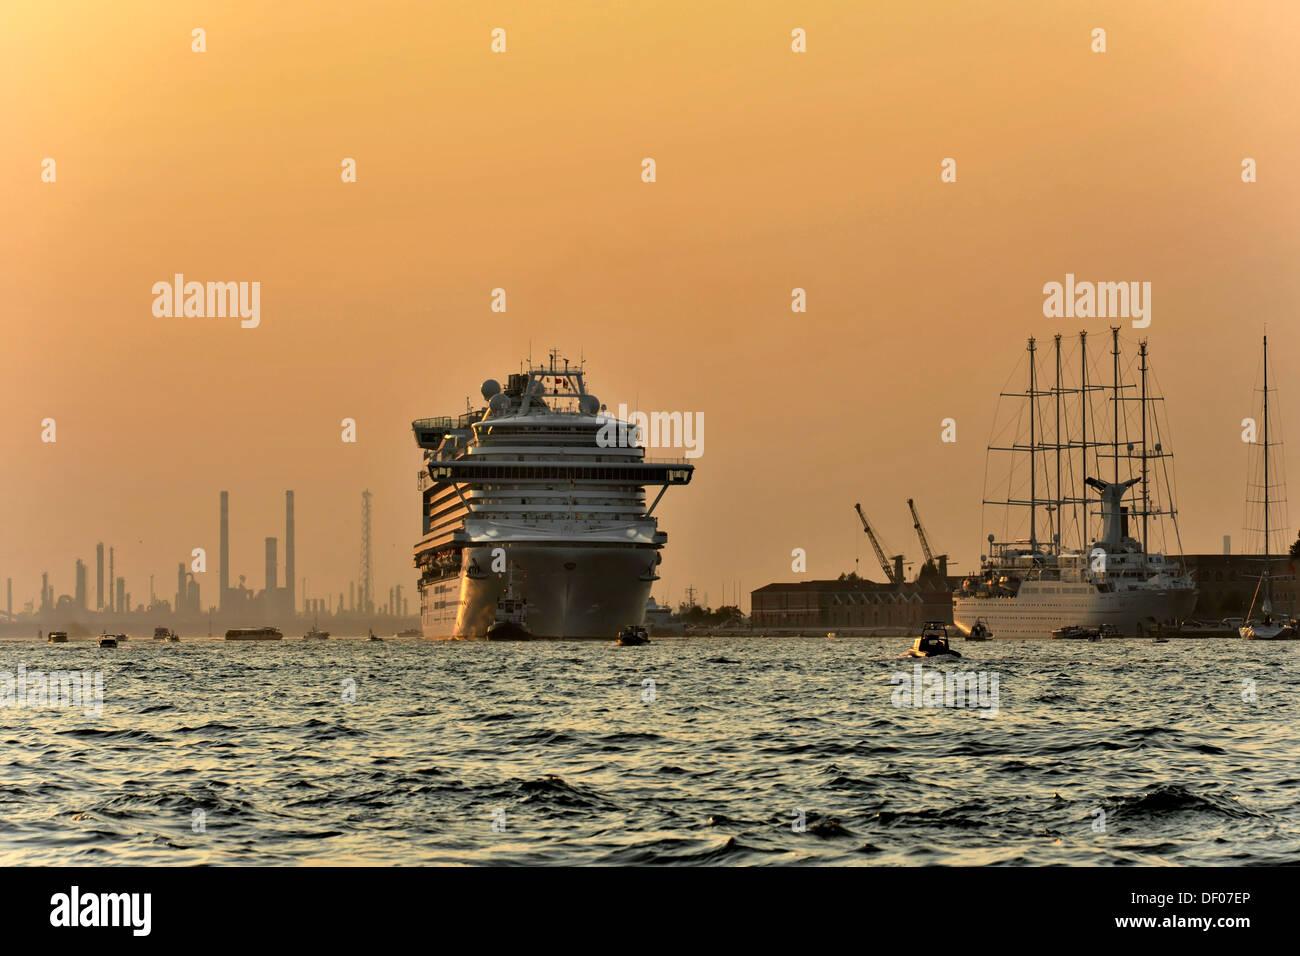 Cruise ship, Azura, built in 2010, 290m, 3100 passengers, leaving Venice, Veneto, Italy, Europe - Stock Image